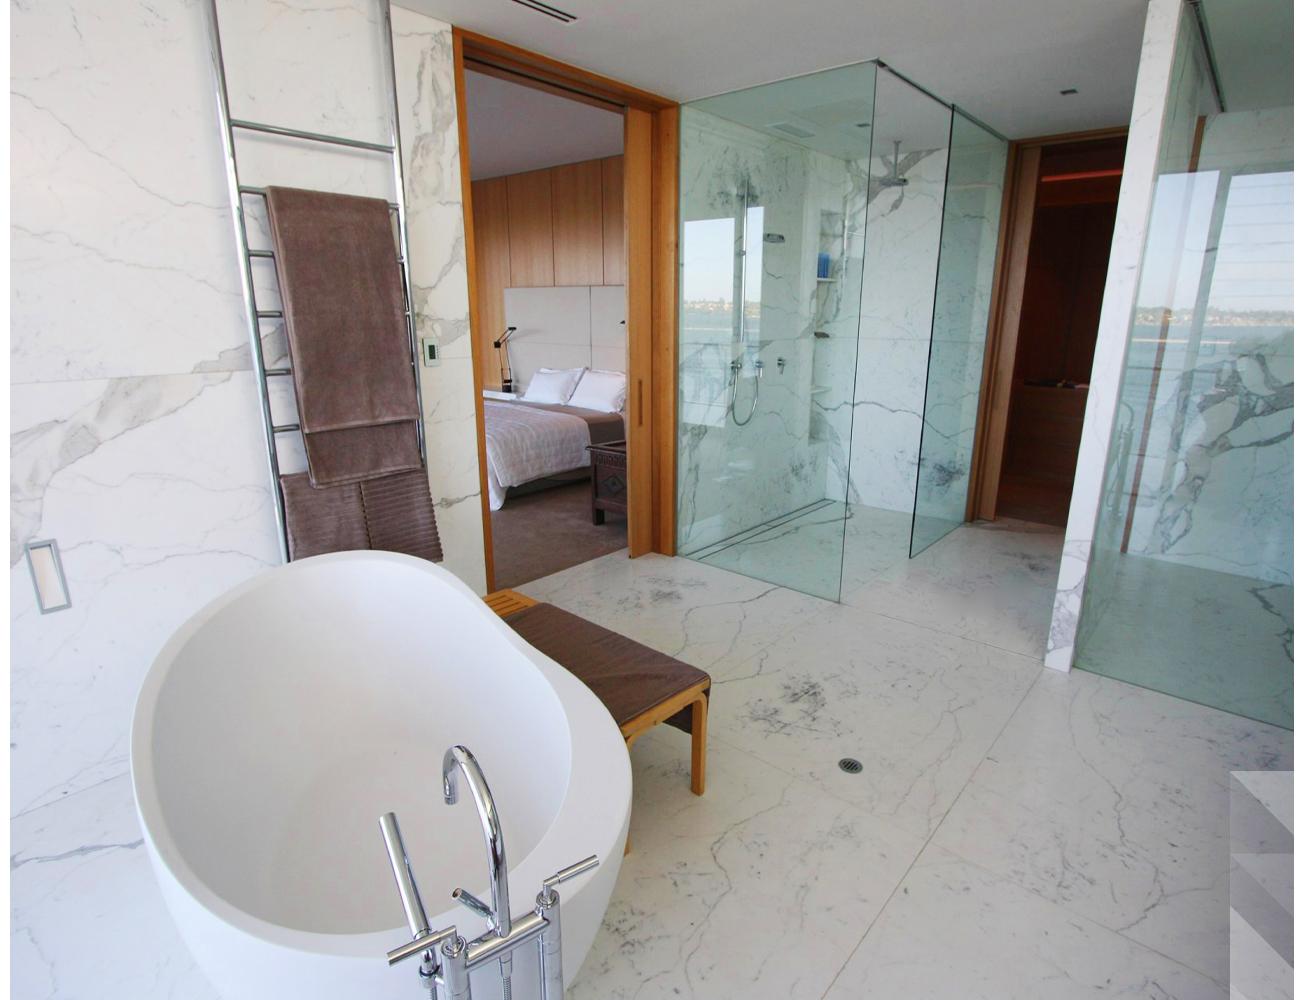 maek-luxury-home-design-inspiration-mosmanpark-bathroom-interior-9.jpg